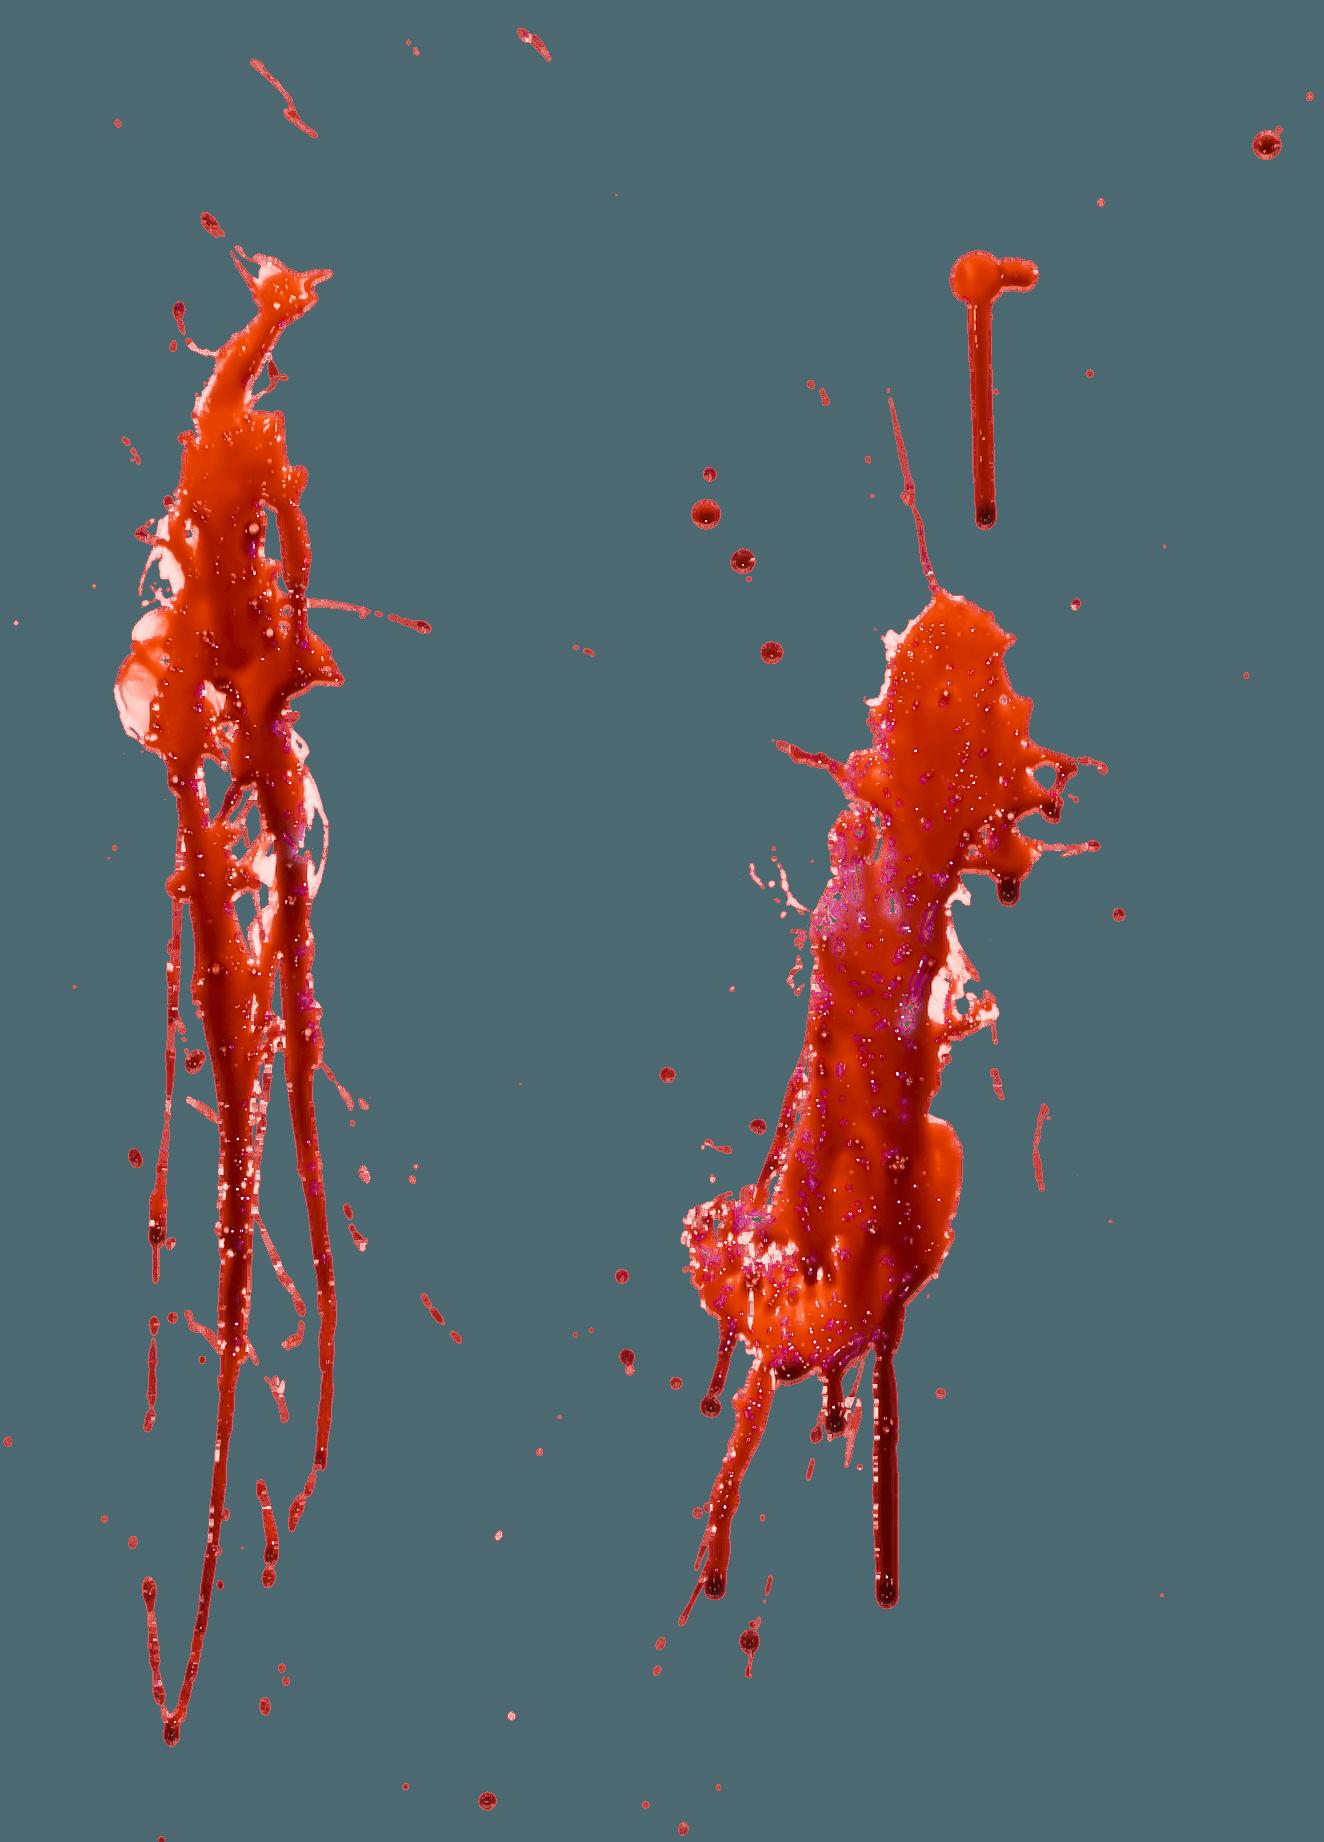 Blood cut png. Image